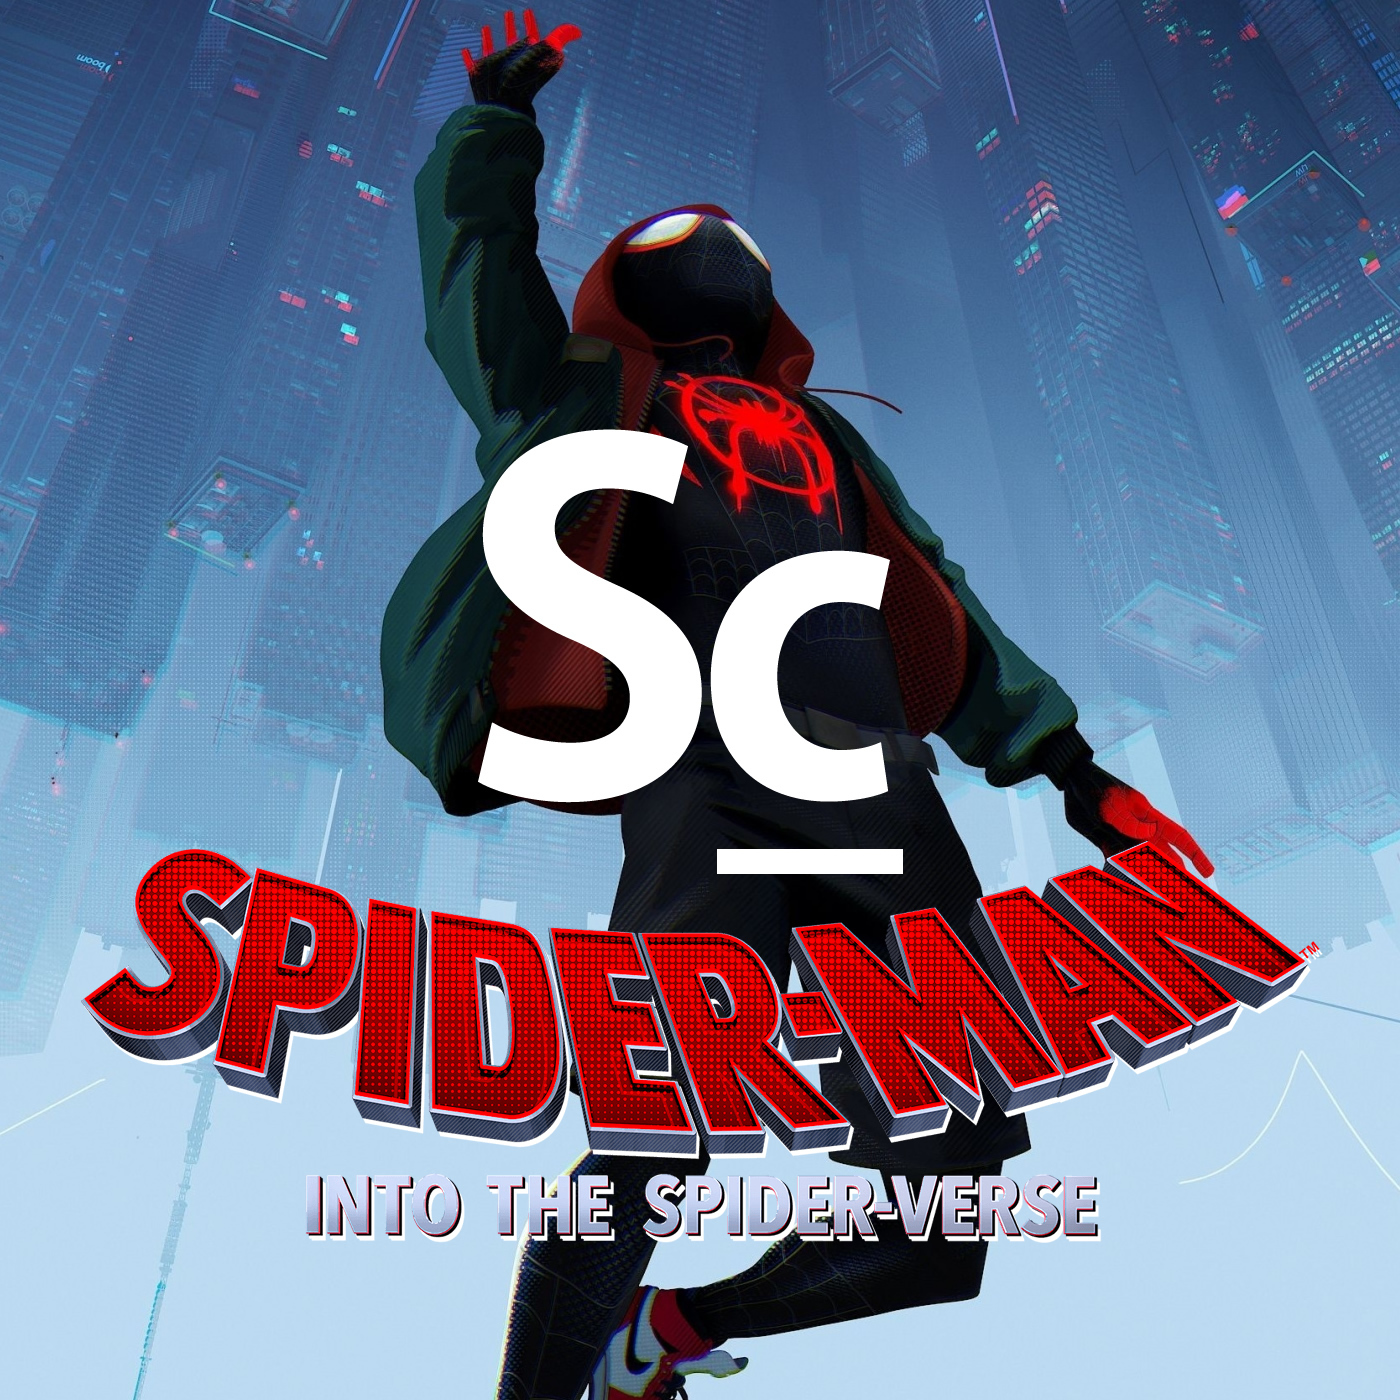 Spider-Man: Into the Spider-verse (Ep. 128)